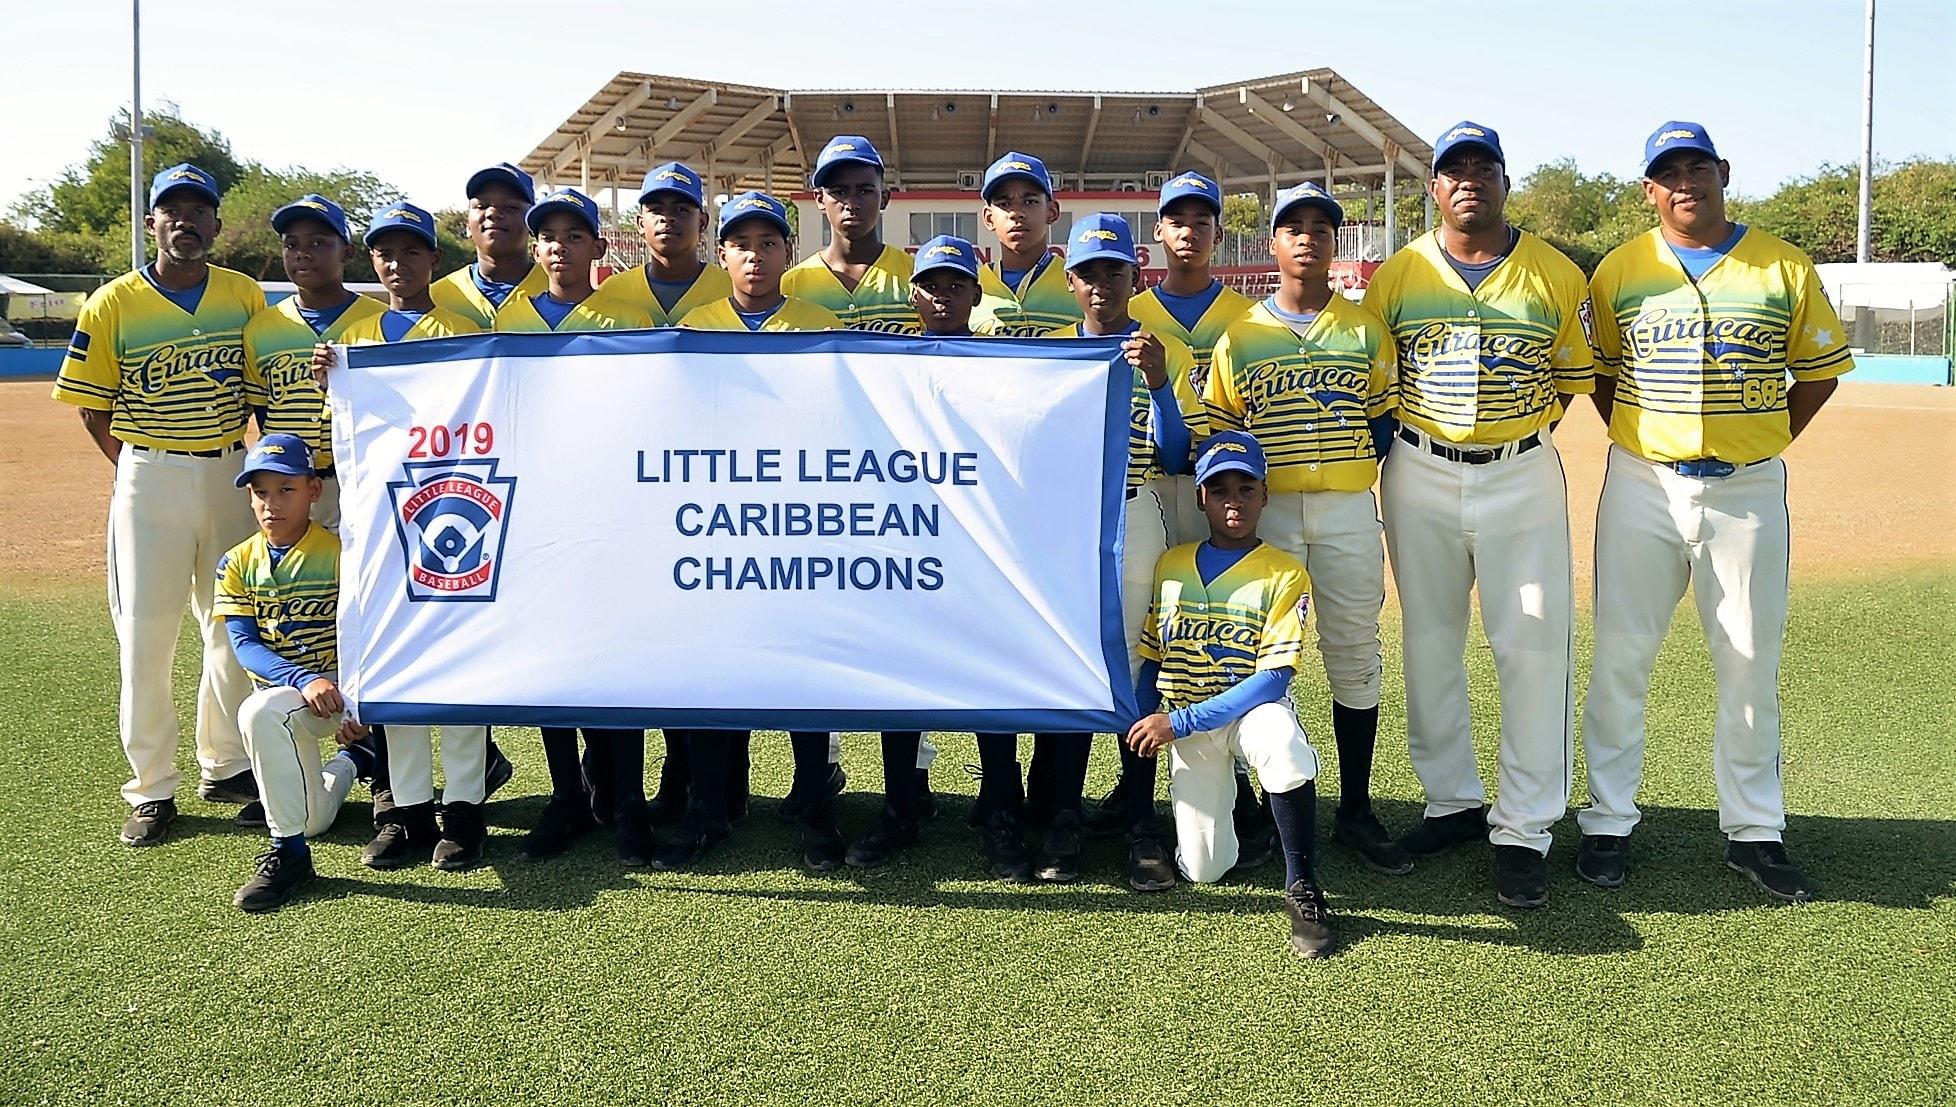 2019 LLB Caribbean Region Champions